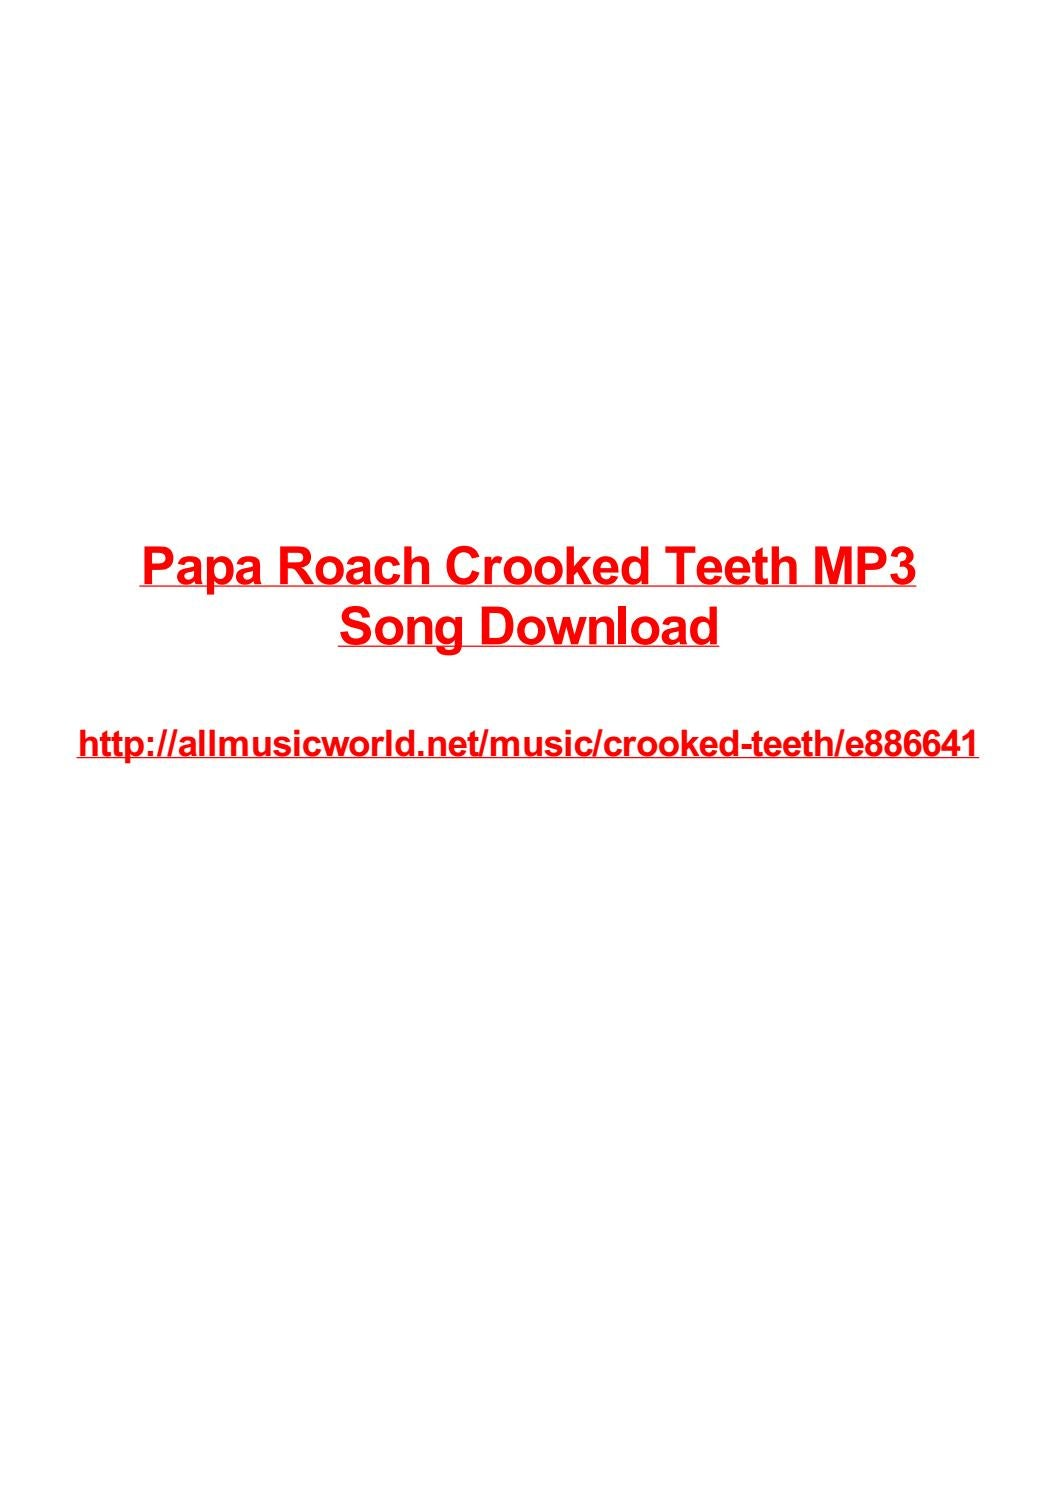 papa roach mp3 download